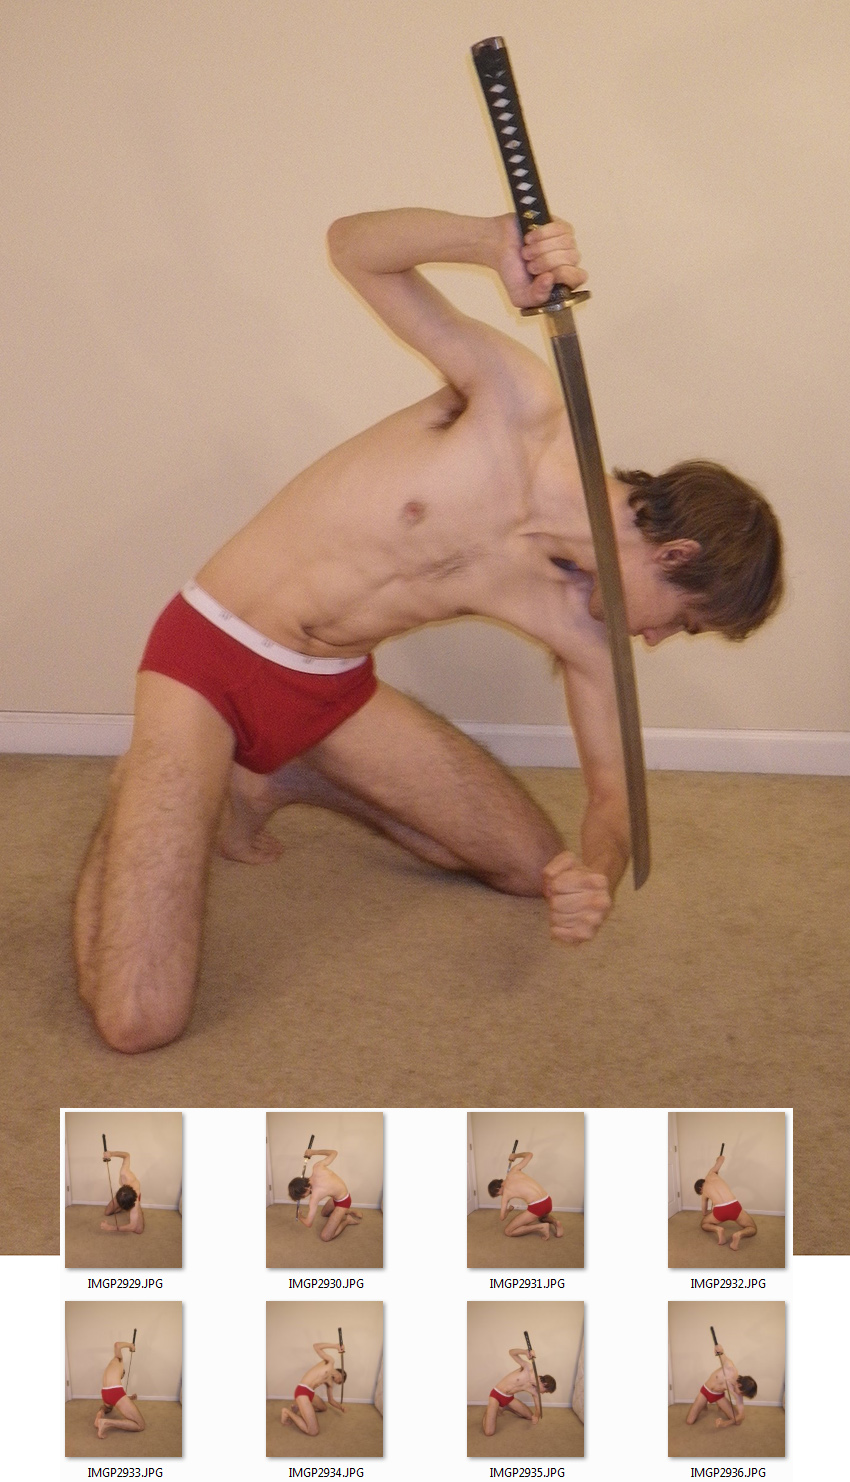 Samurai Sword 2 [C] by MostlyGuyStock